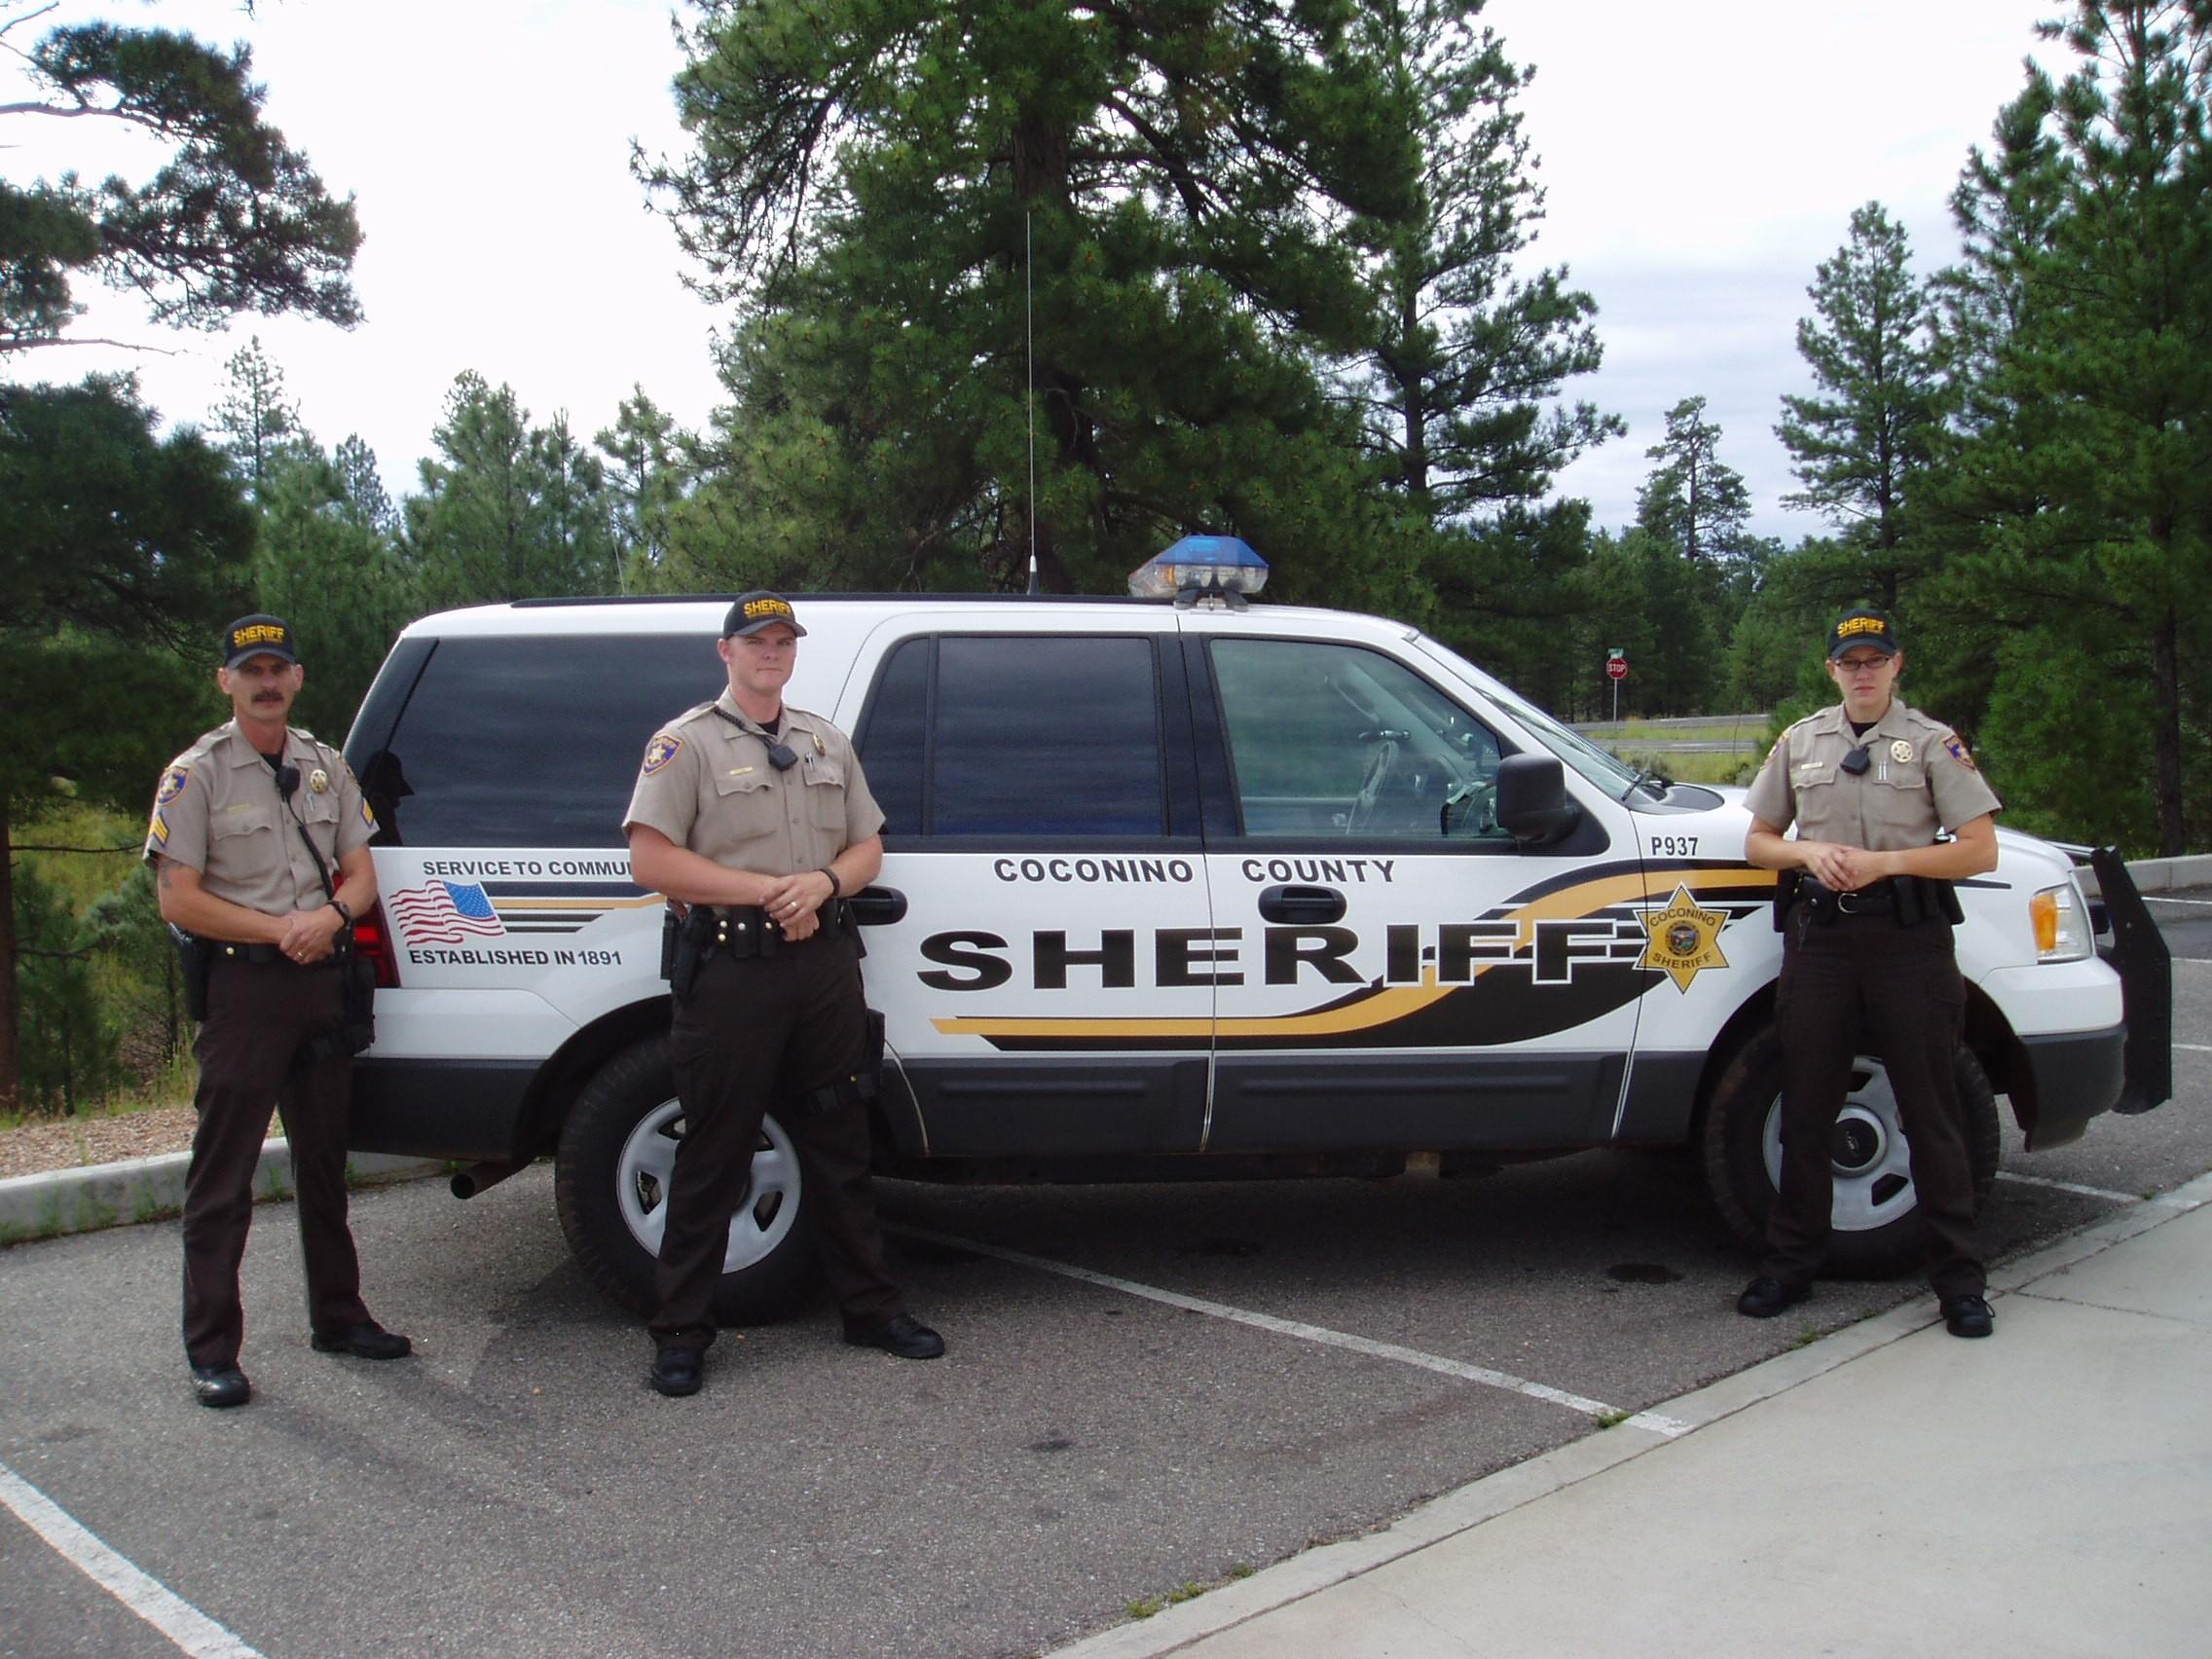 Coconino Sheriff Deputies by patrol vehicle